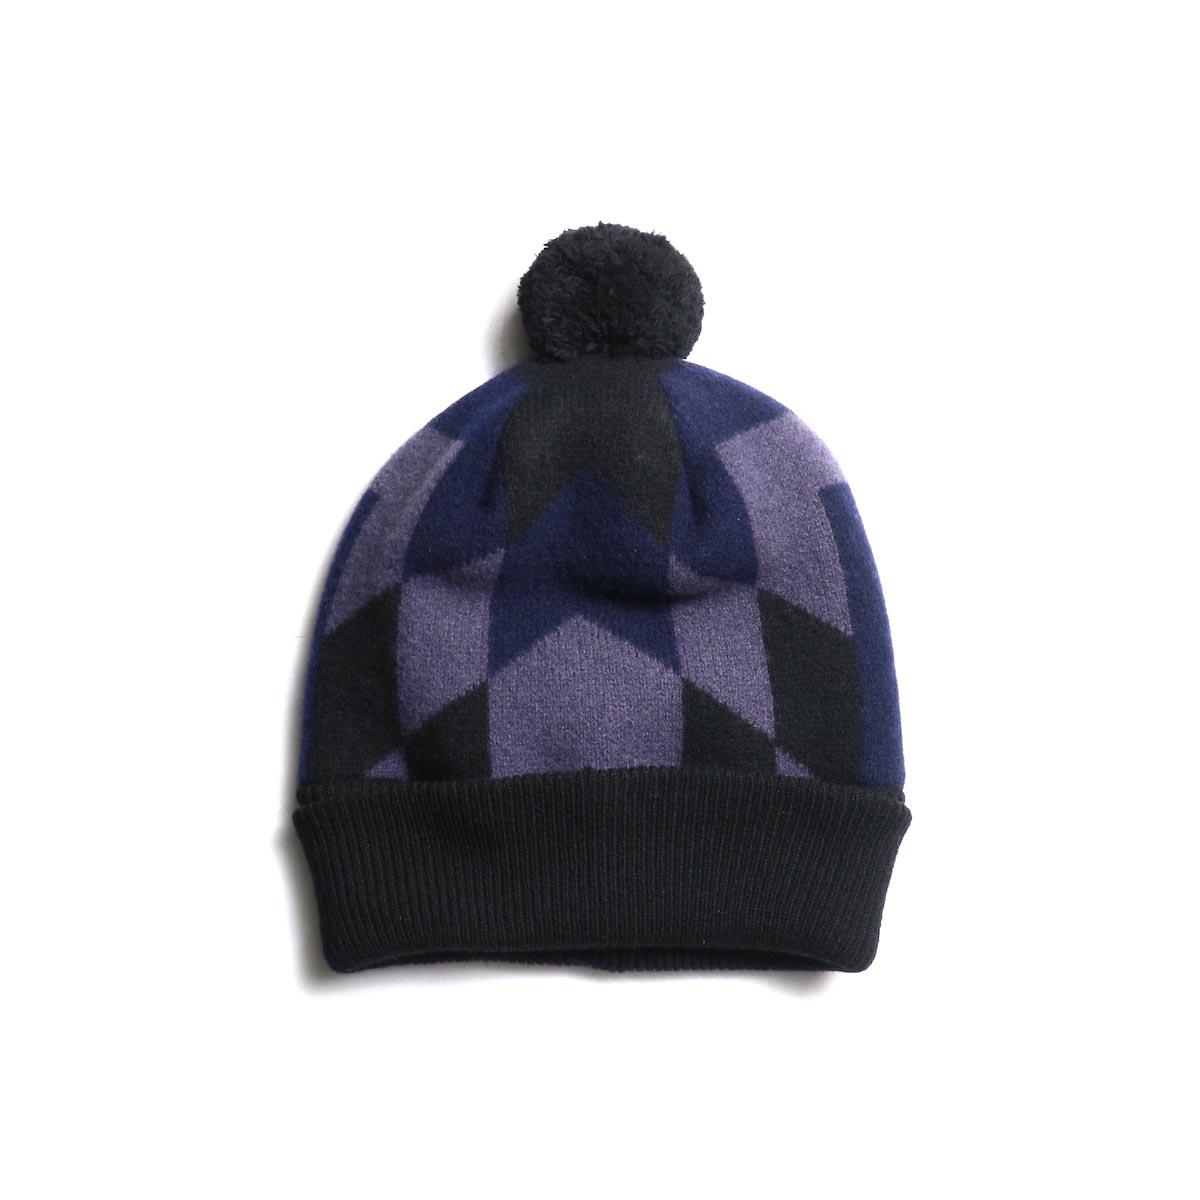 The Soloist / sk.0004AW19 ski cap. -Black × Mid Night × Eggplant